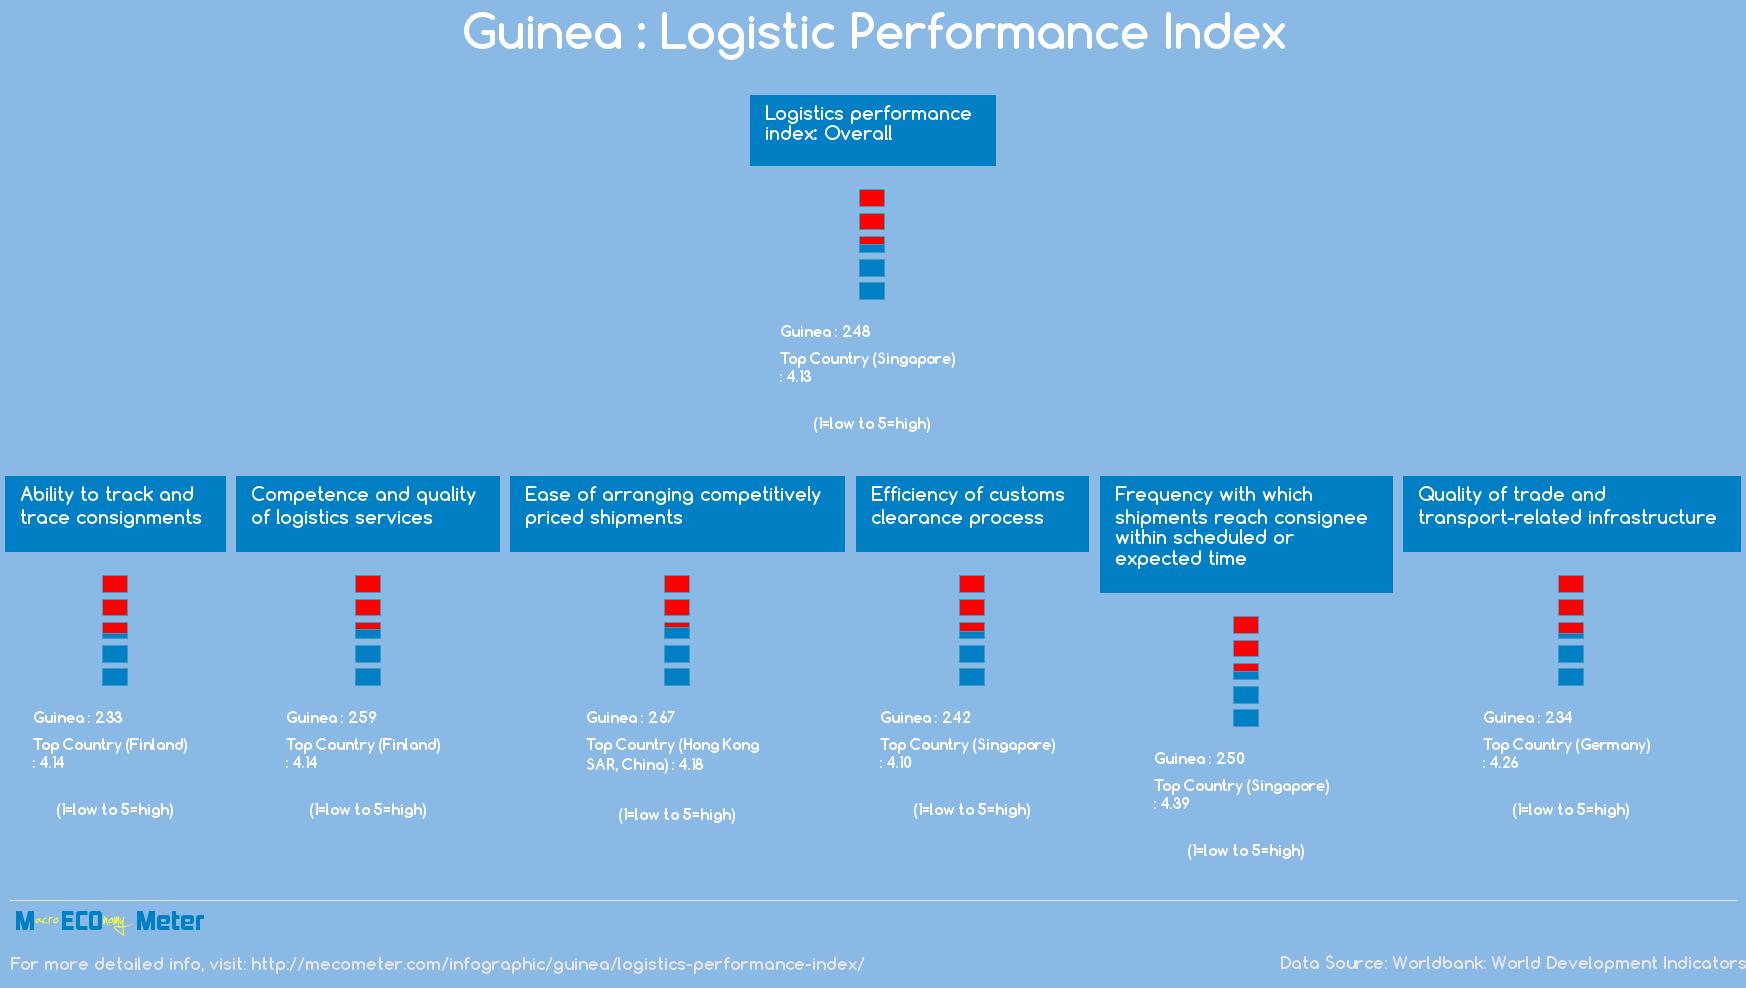 Guinea : Logistic Performance Index